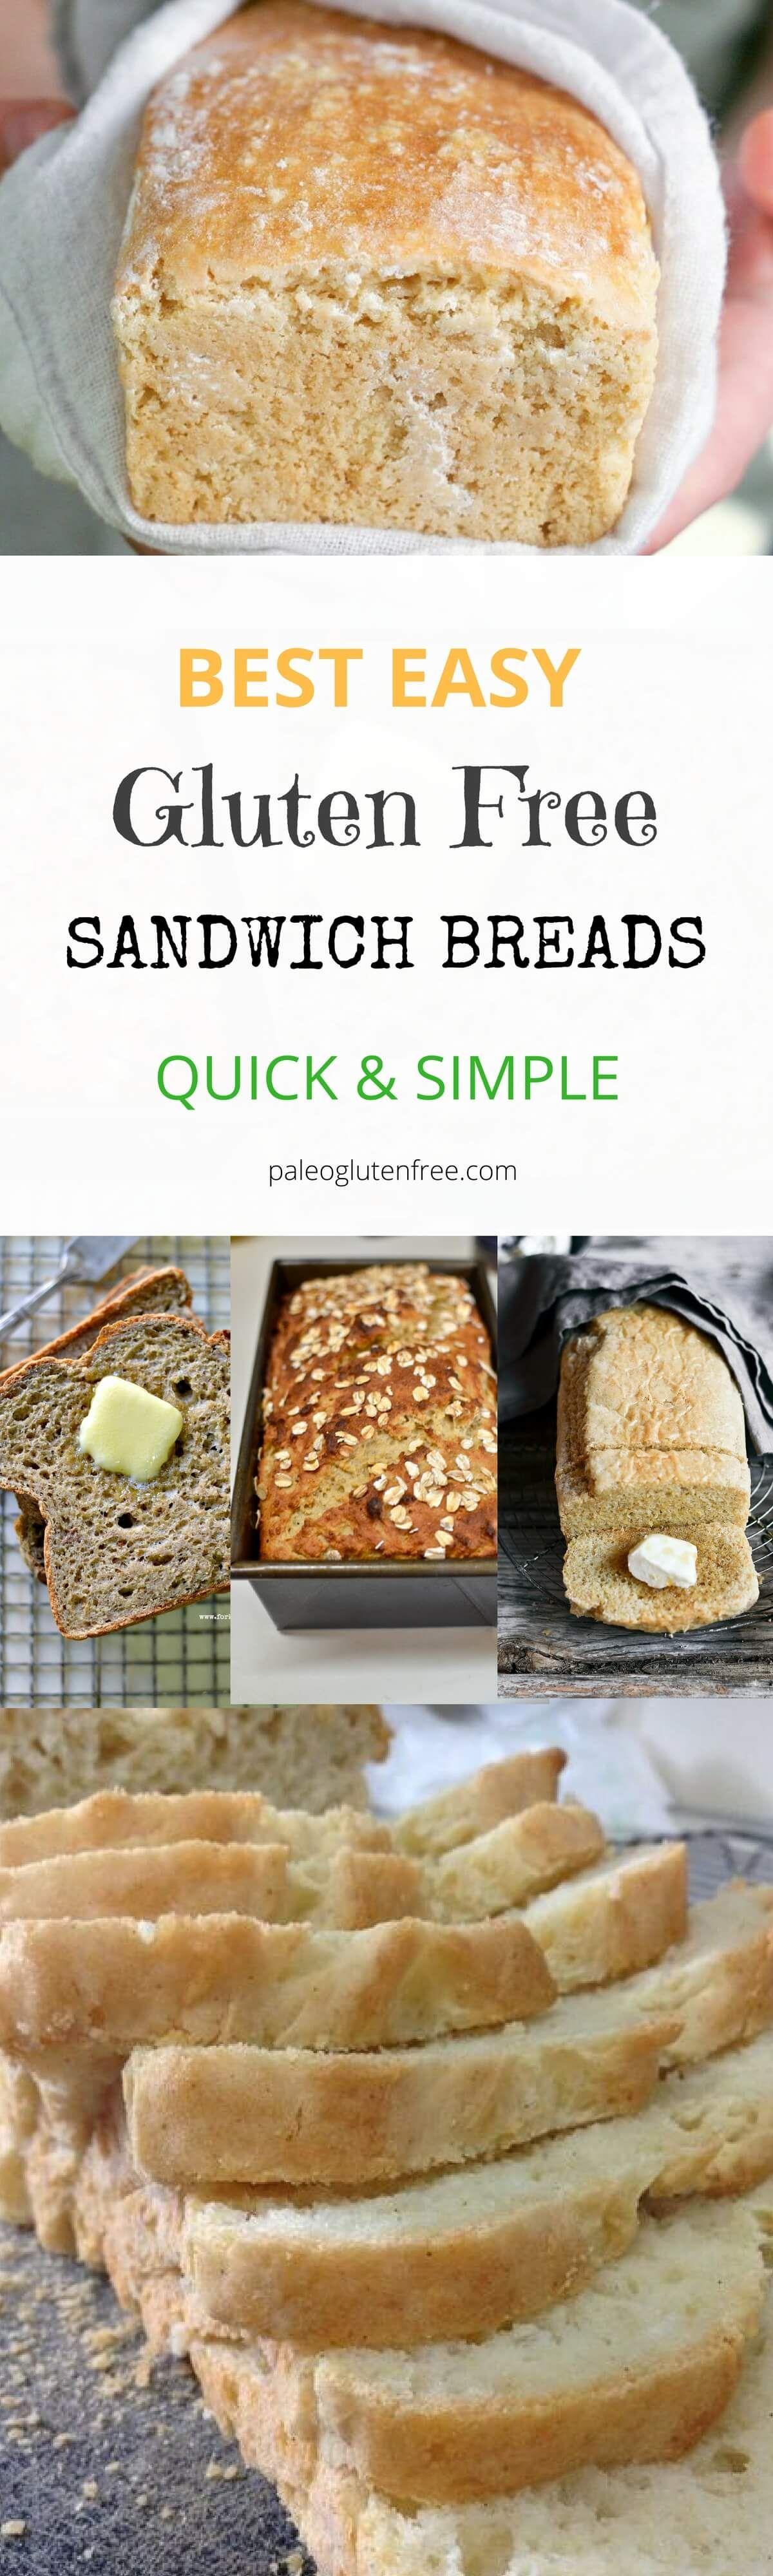 Easy gluten free bread recipes. Gluten free bread